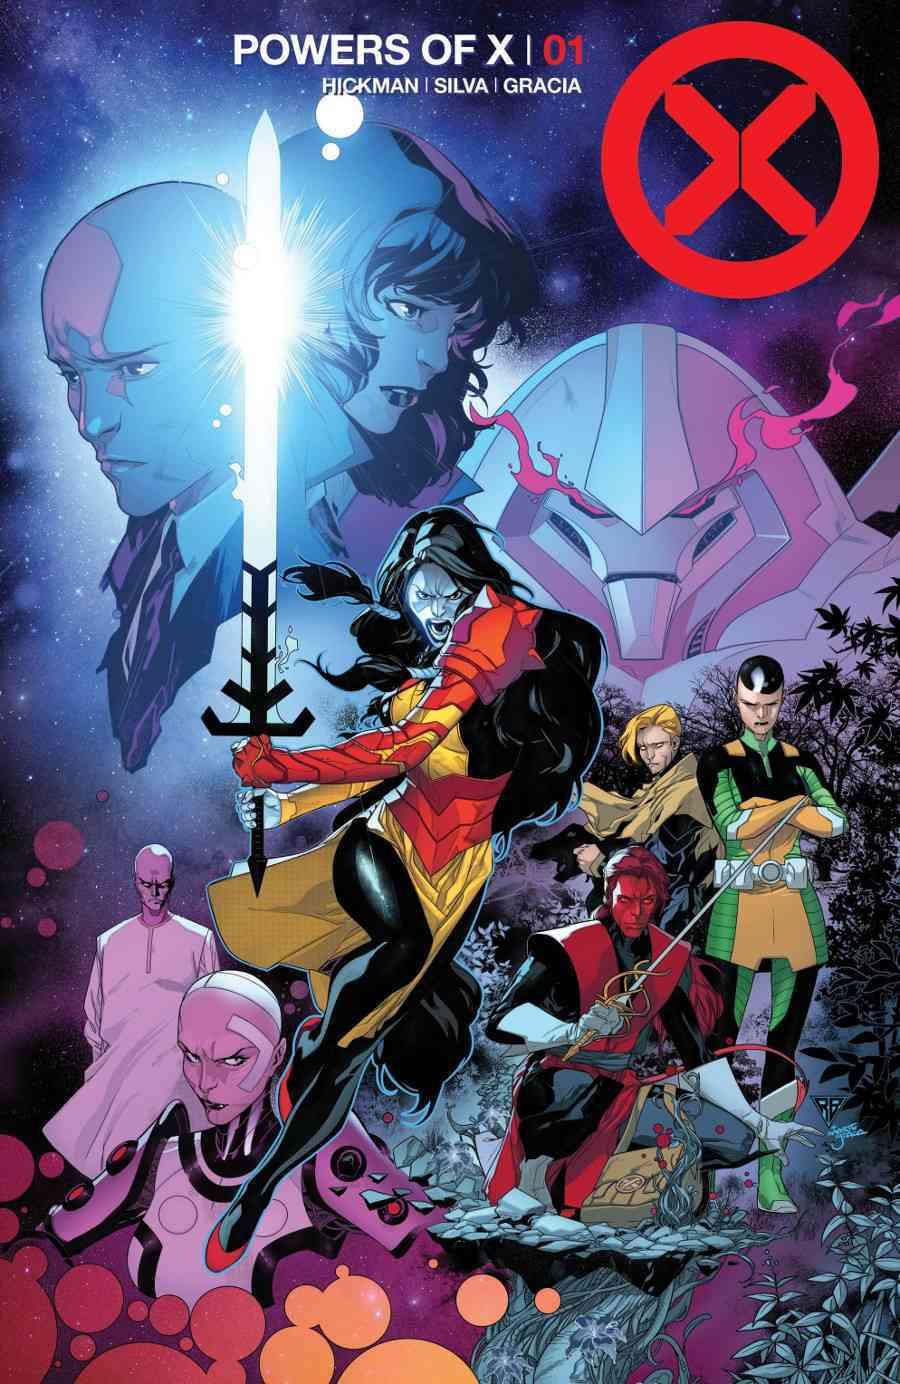 X-Men: Powers of X by Marvel Comics